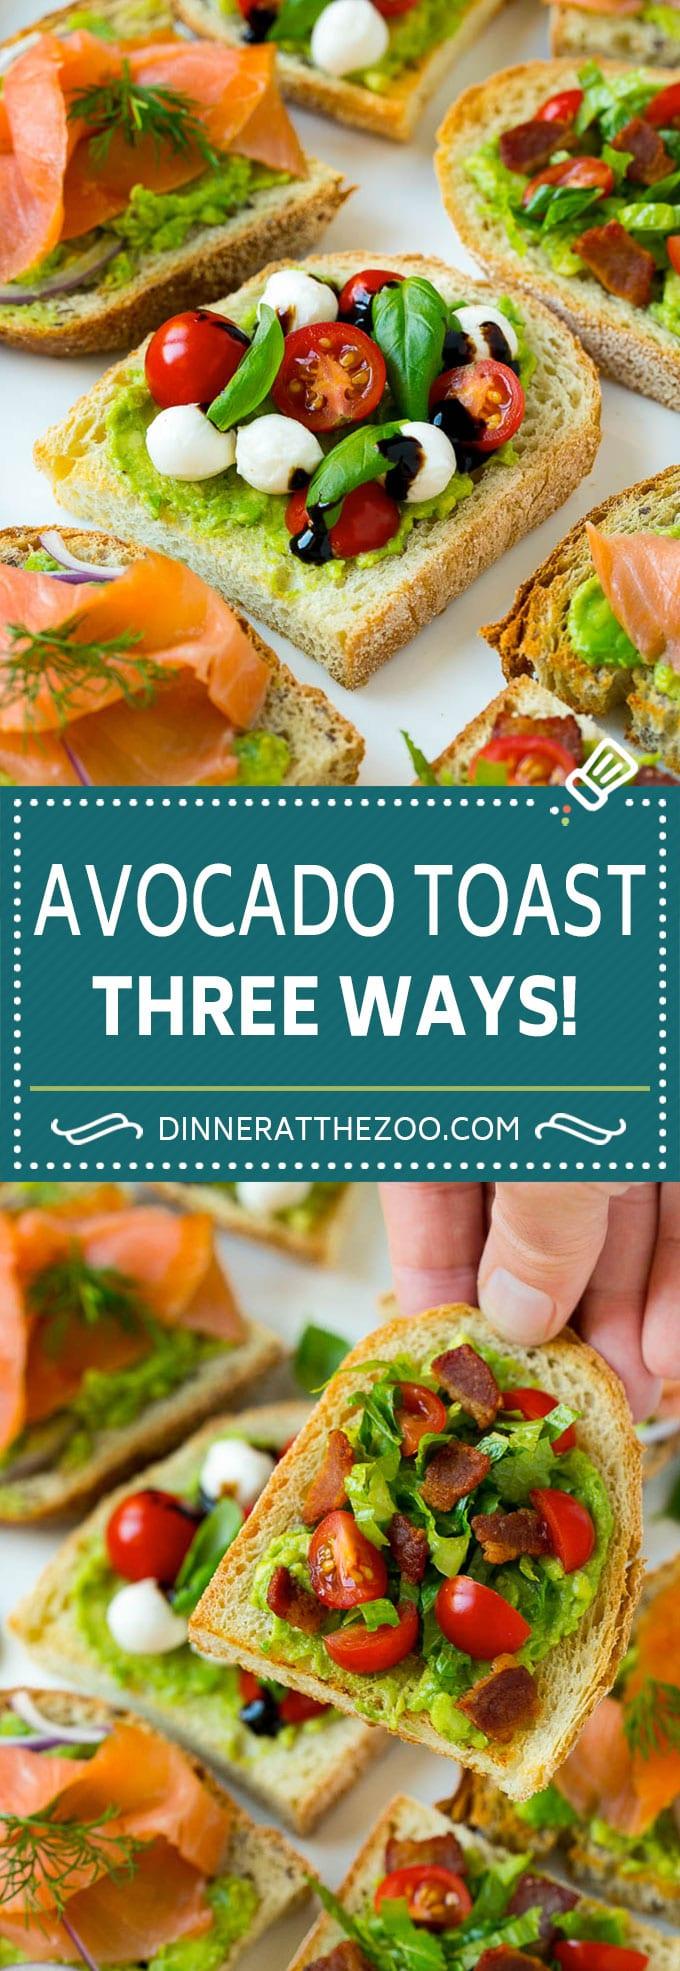 Avocado Toast Recipe | Avocado Appetizer #avocado #toast #appetizer #snack #dinneratthezoo